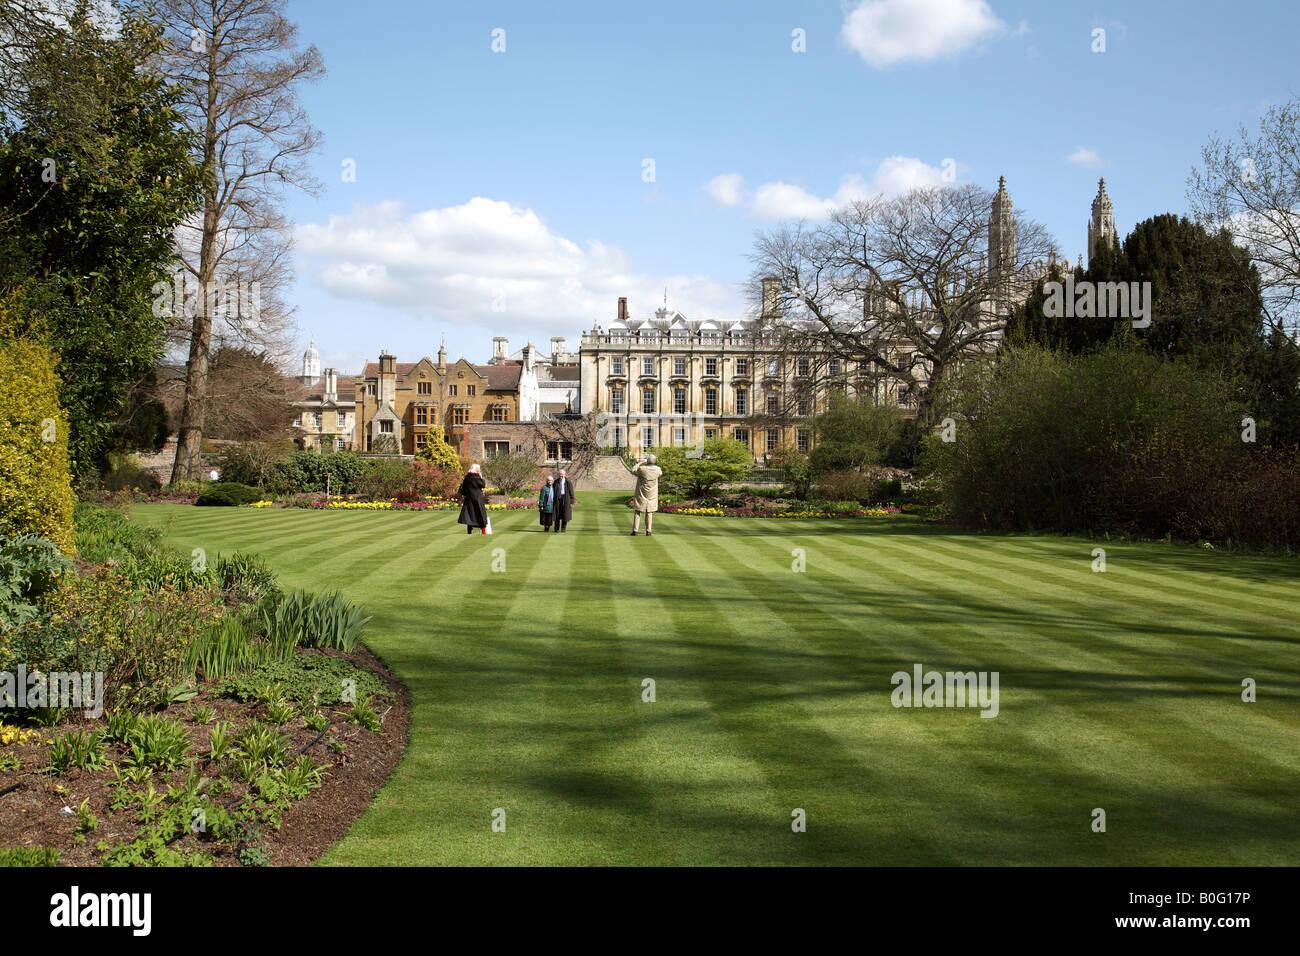 Tourists enjoy the Fellows Garden, Clare College, Cambridge on a fine spring morning - Stock Image